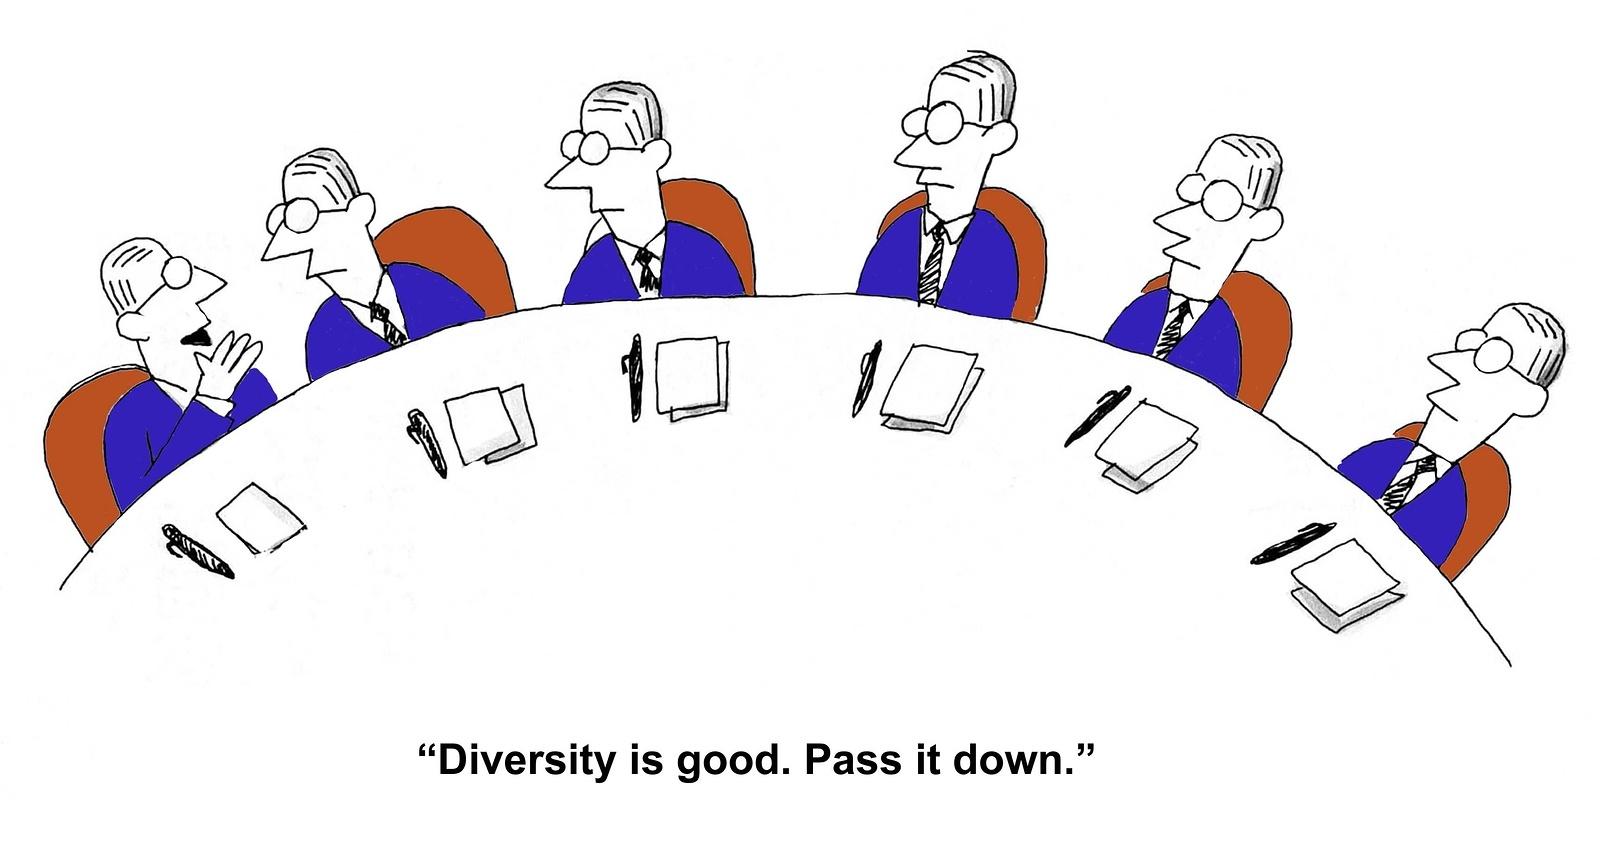 bigstock-Diversity-is-Good-81646265.jpg